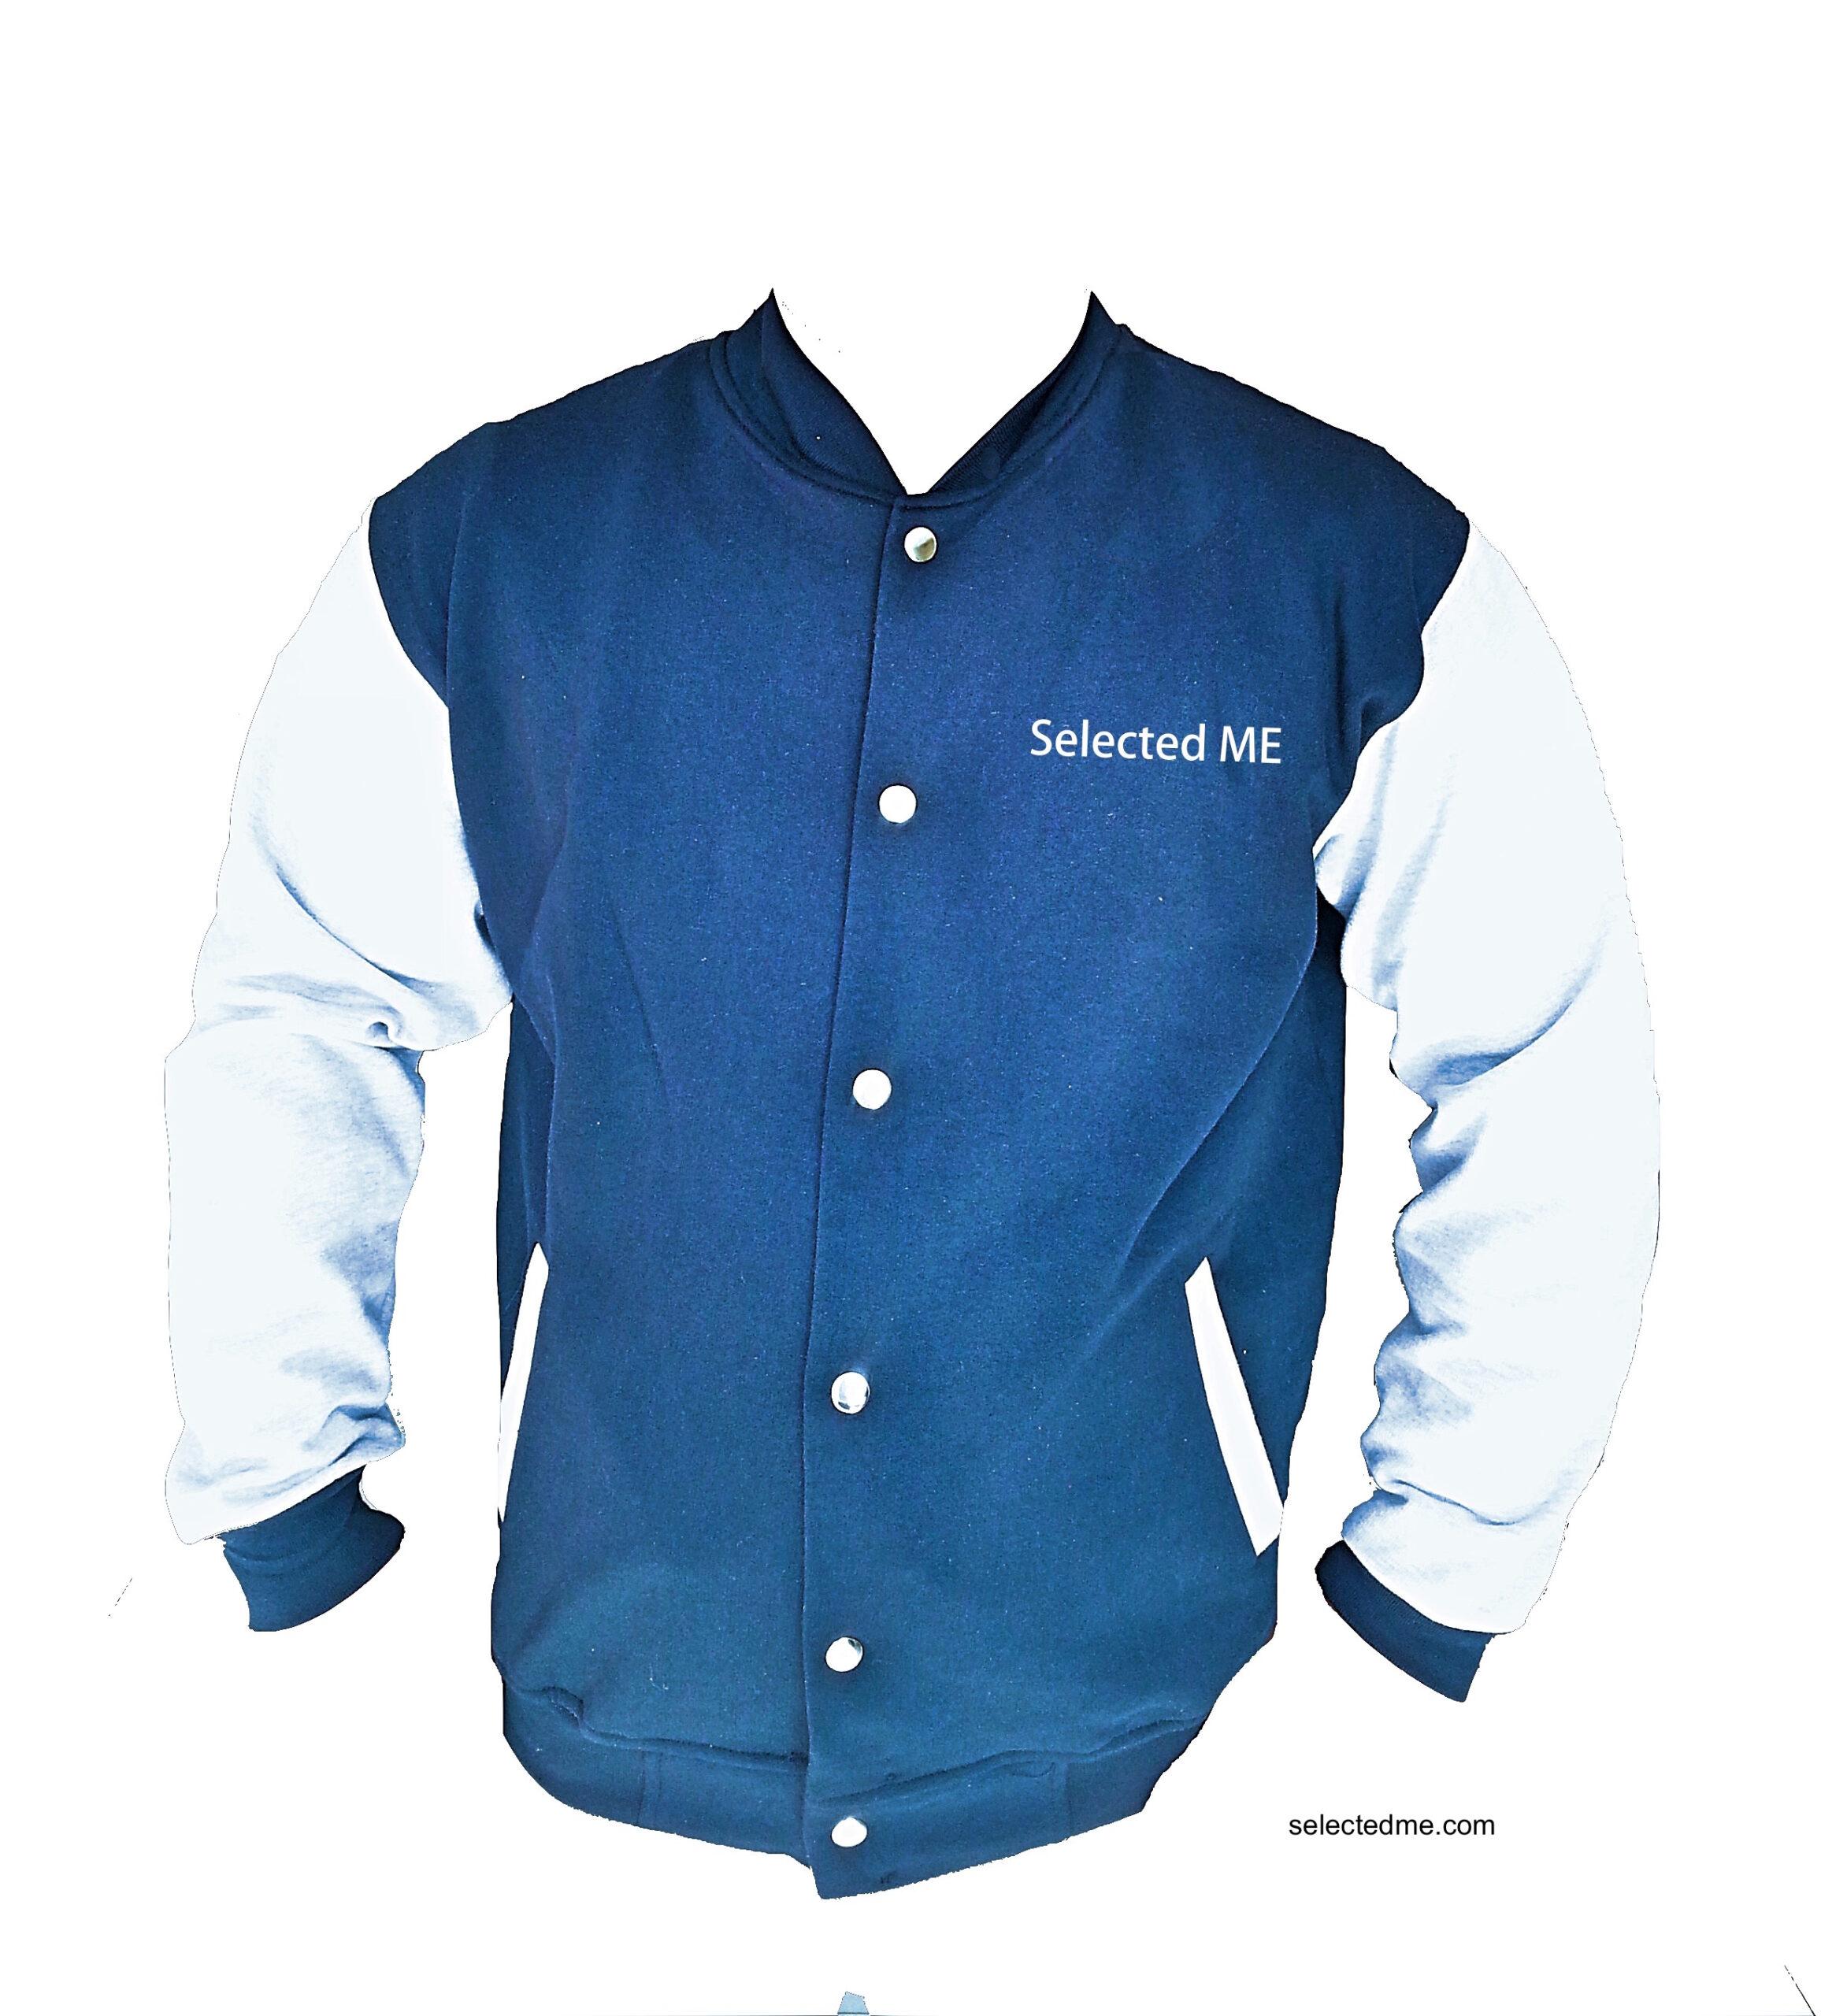 Sweatshirts Wholesale - Bulk Hoodies & Sweatshirts